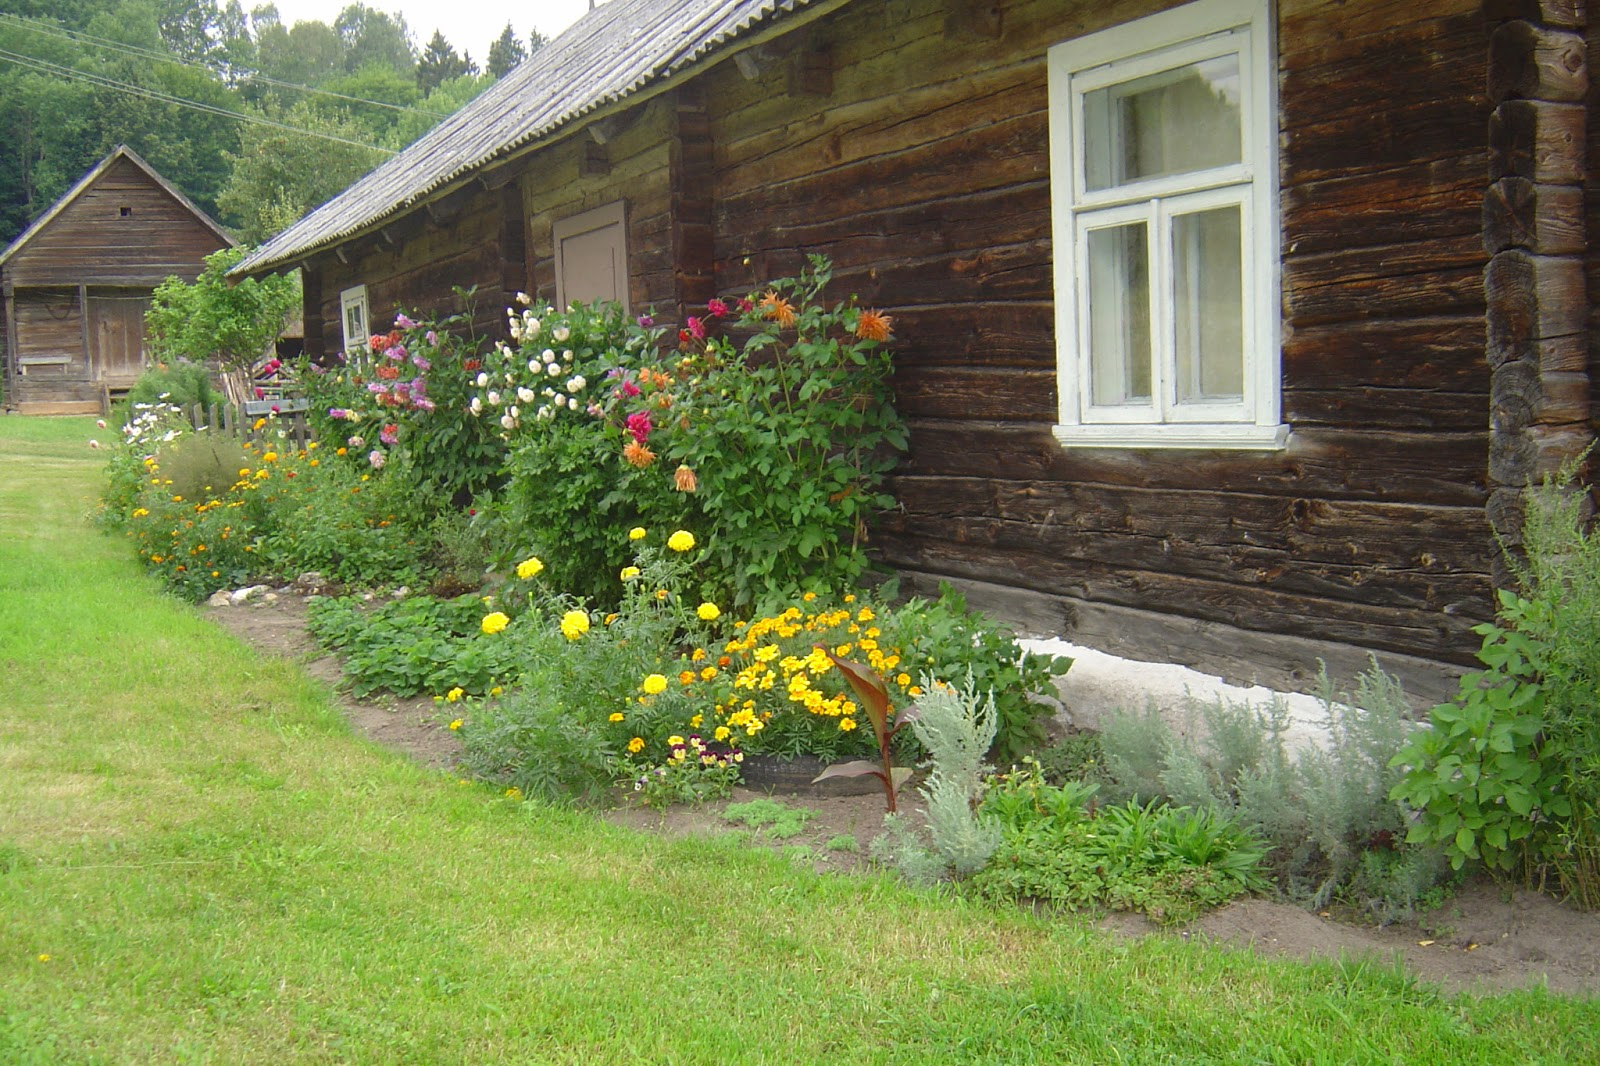 Country (kaimiško) stiliaus sodas